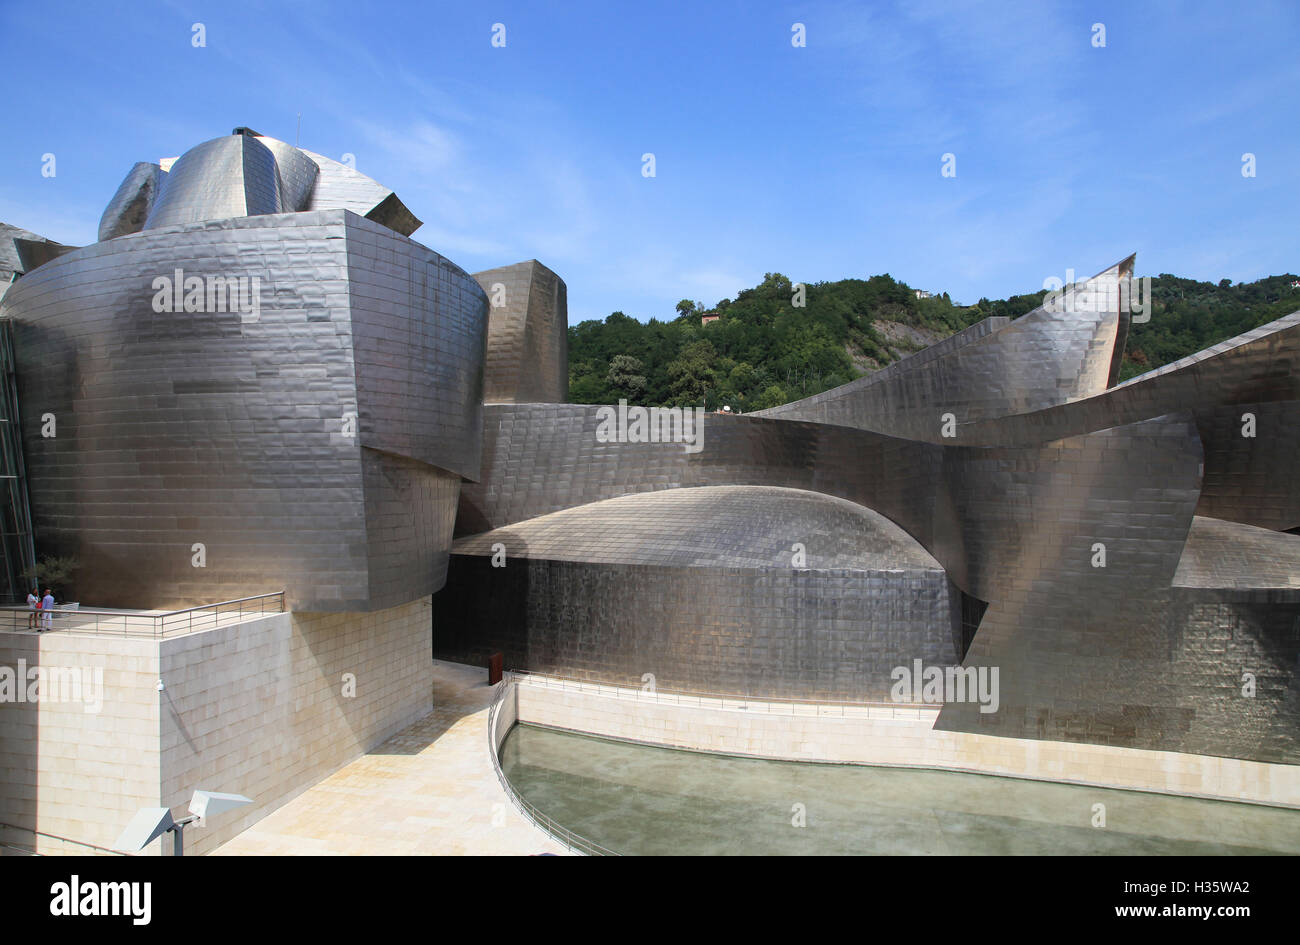 Guggenheim Architect Frank Gehry Bilbao Spain - Stock Image